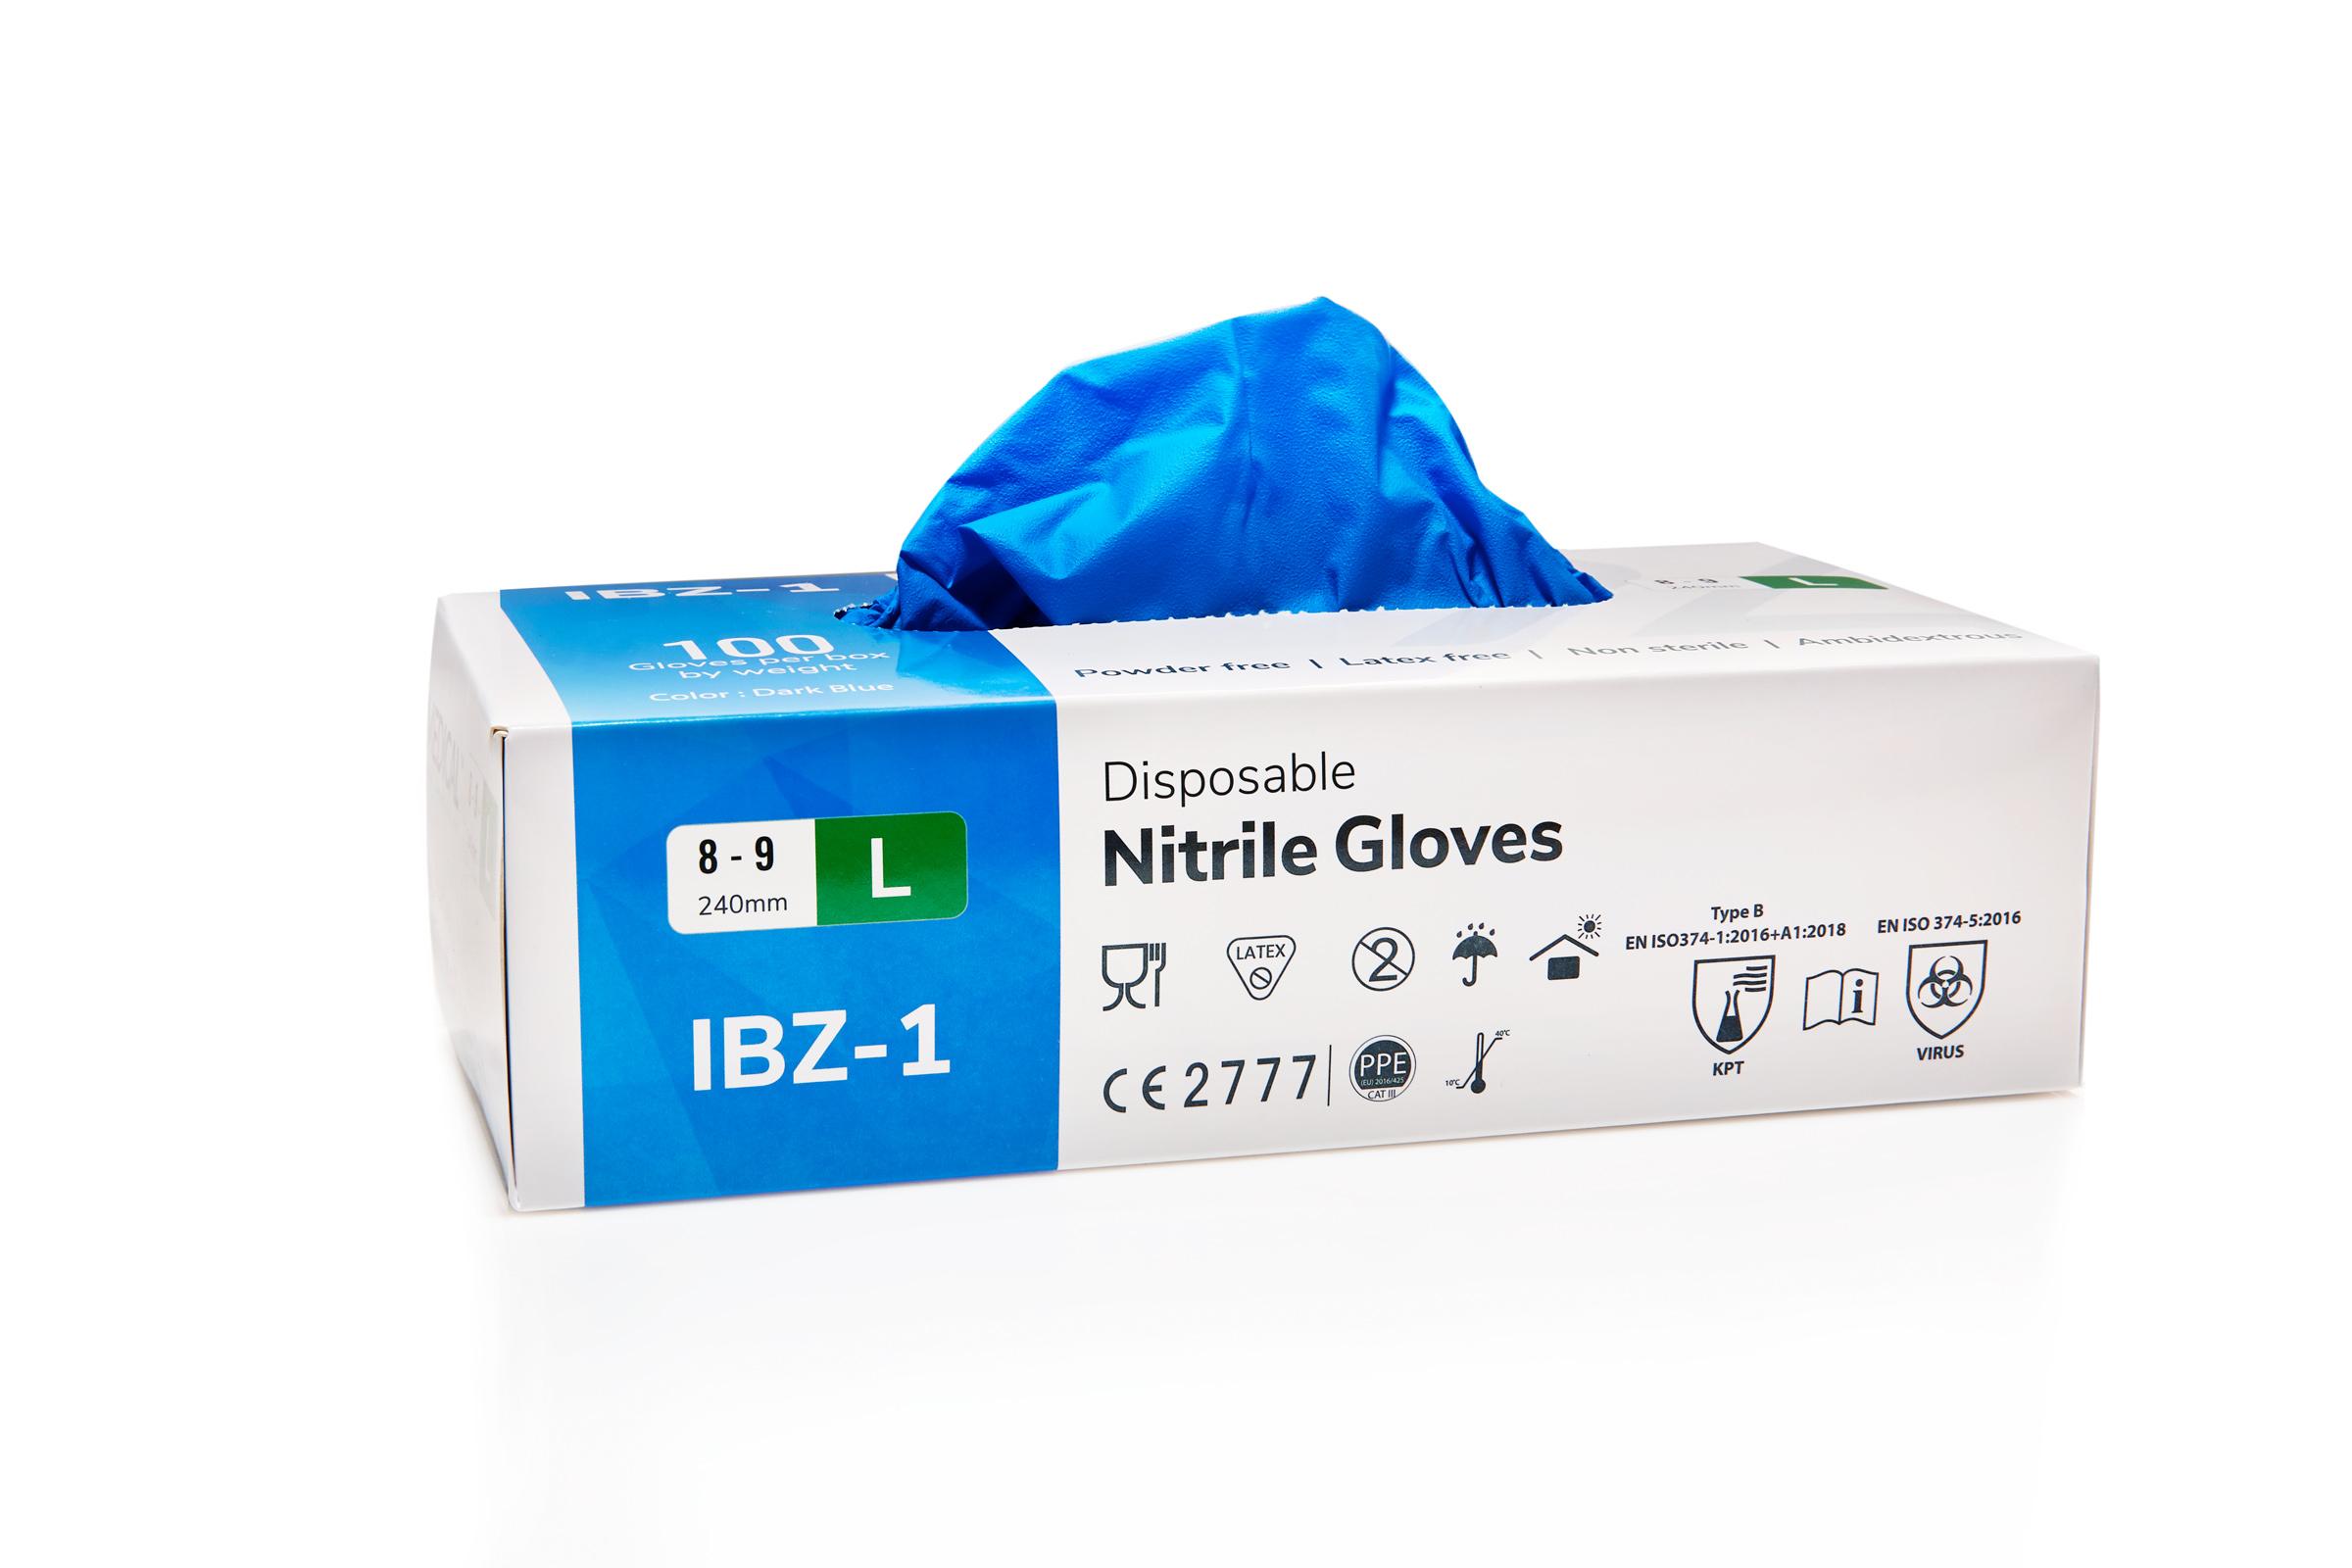 Nitril Handschuhe - 100 Stück